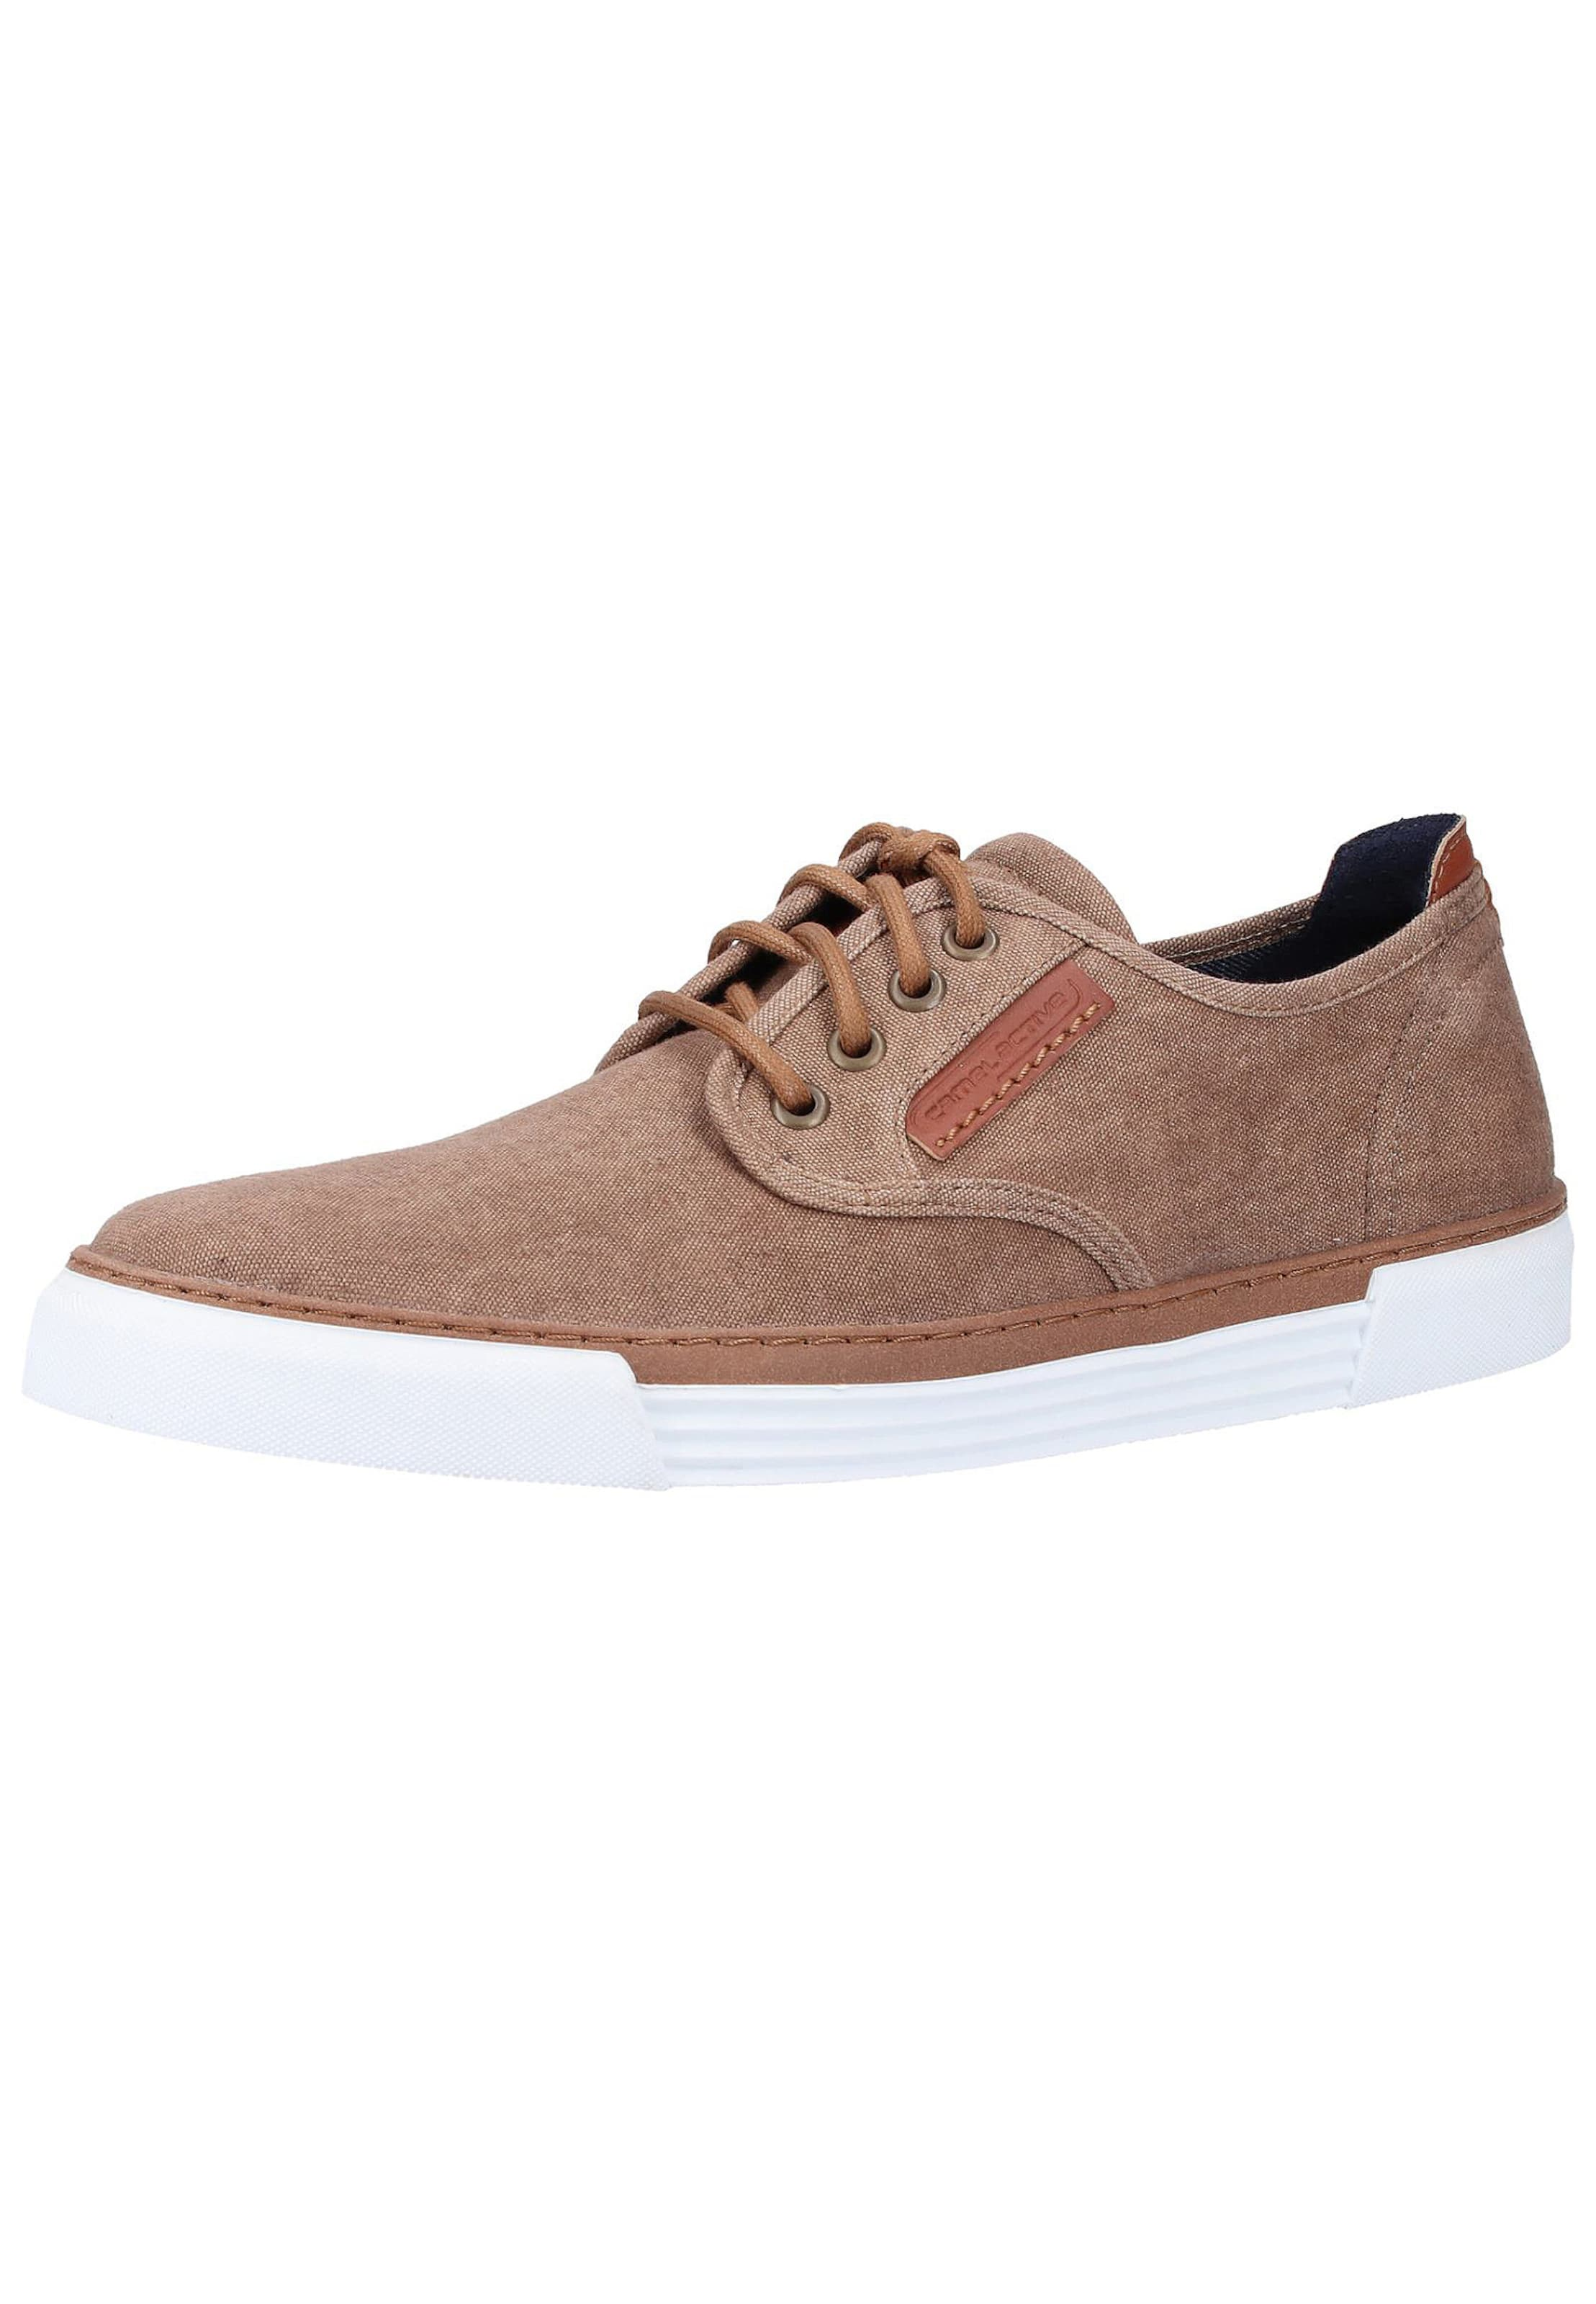 Braun Sneaker In Camel Camel Active Active Sneaker In WH2IYeED9